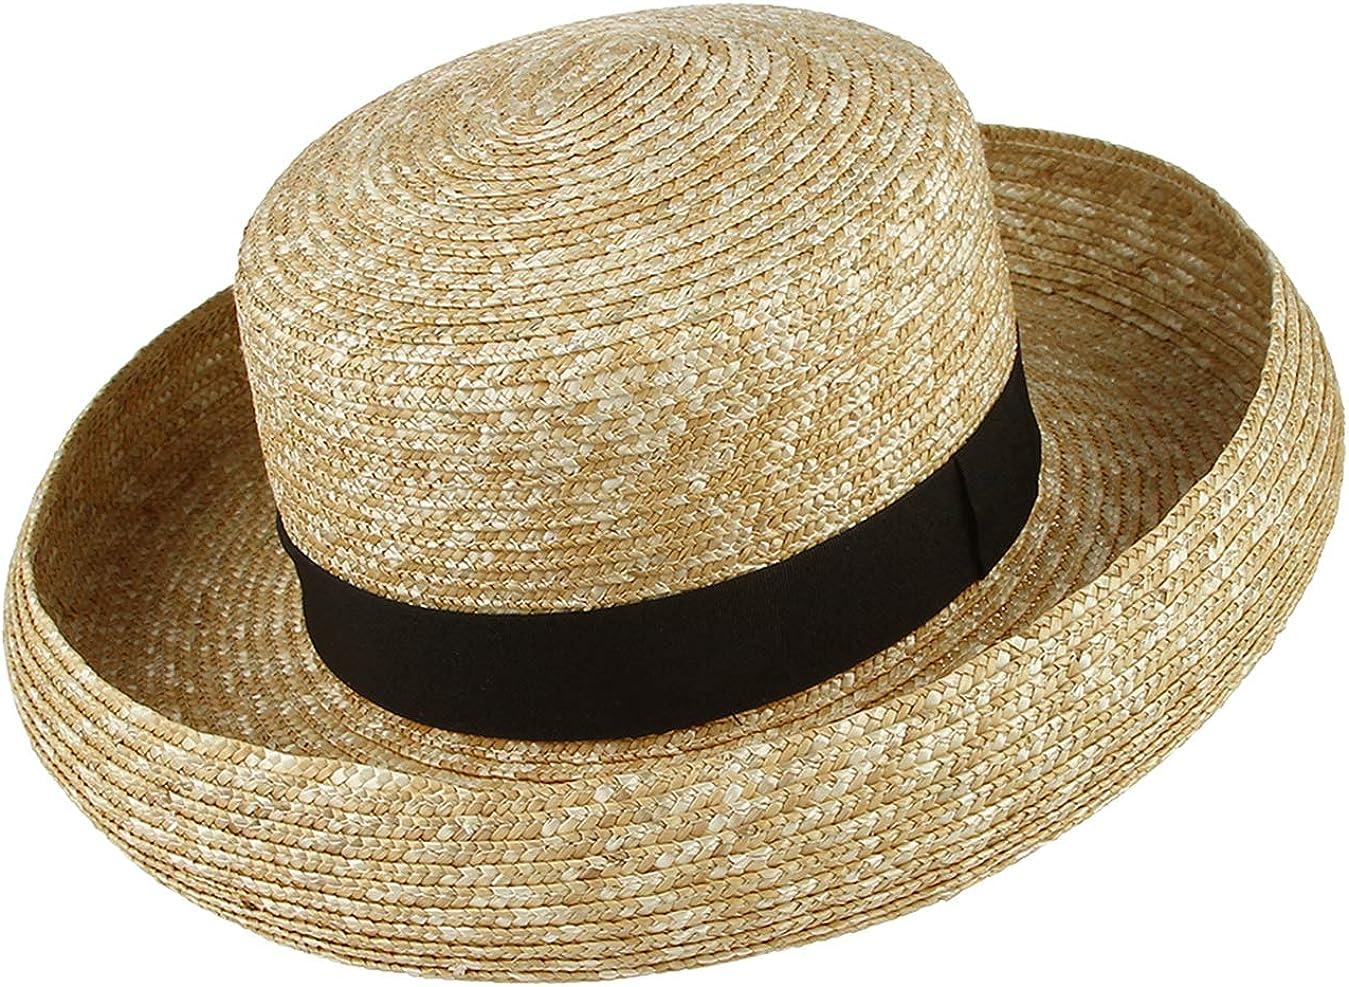 New Edwardian Style Men's Hats 1900-1920 Jelord Women Vintage Elegant Straw Sun Hat UV Protection Flat Top Roll Rim Panama Boater Hat Beach Sun Hat $15.39 AT vintagedancer.com